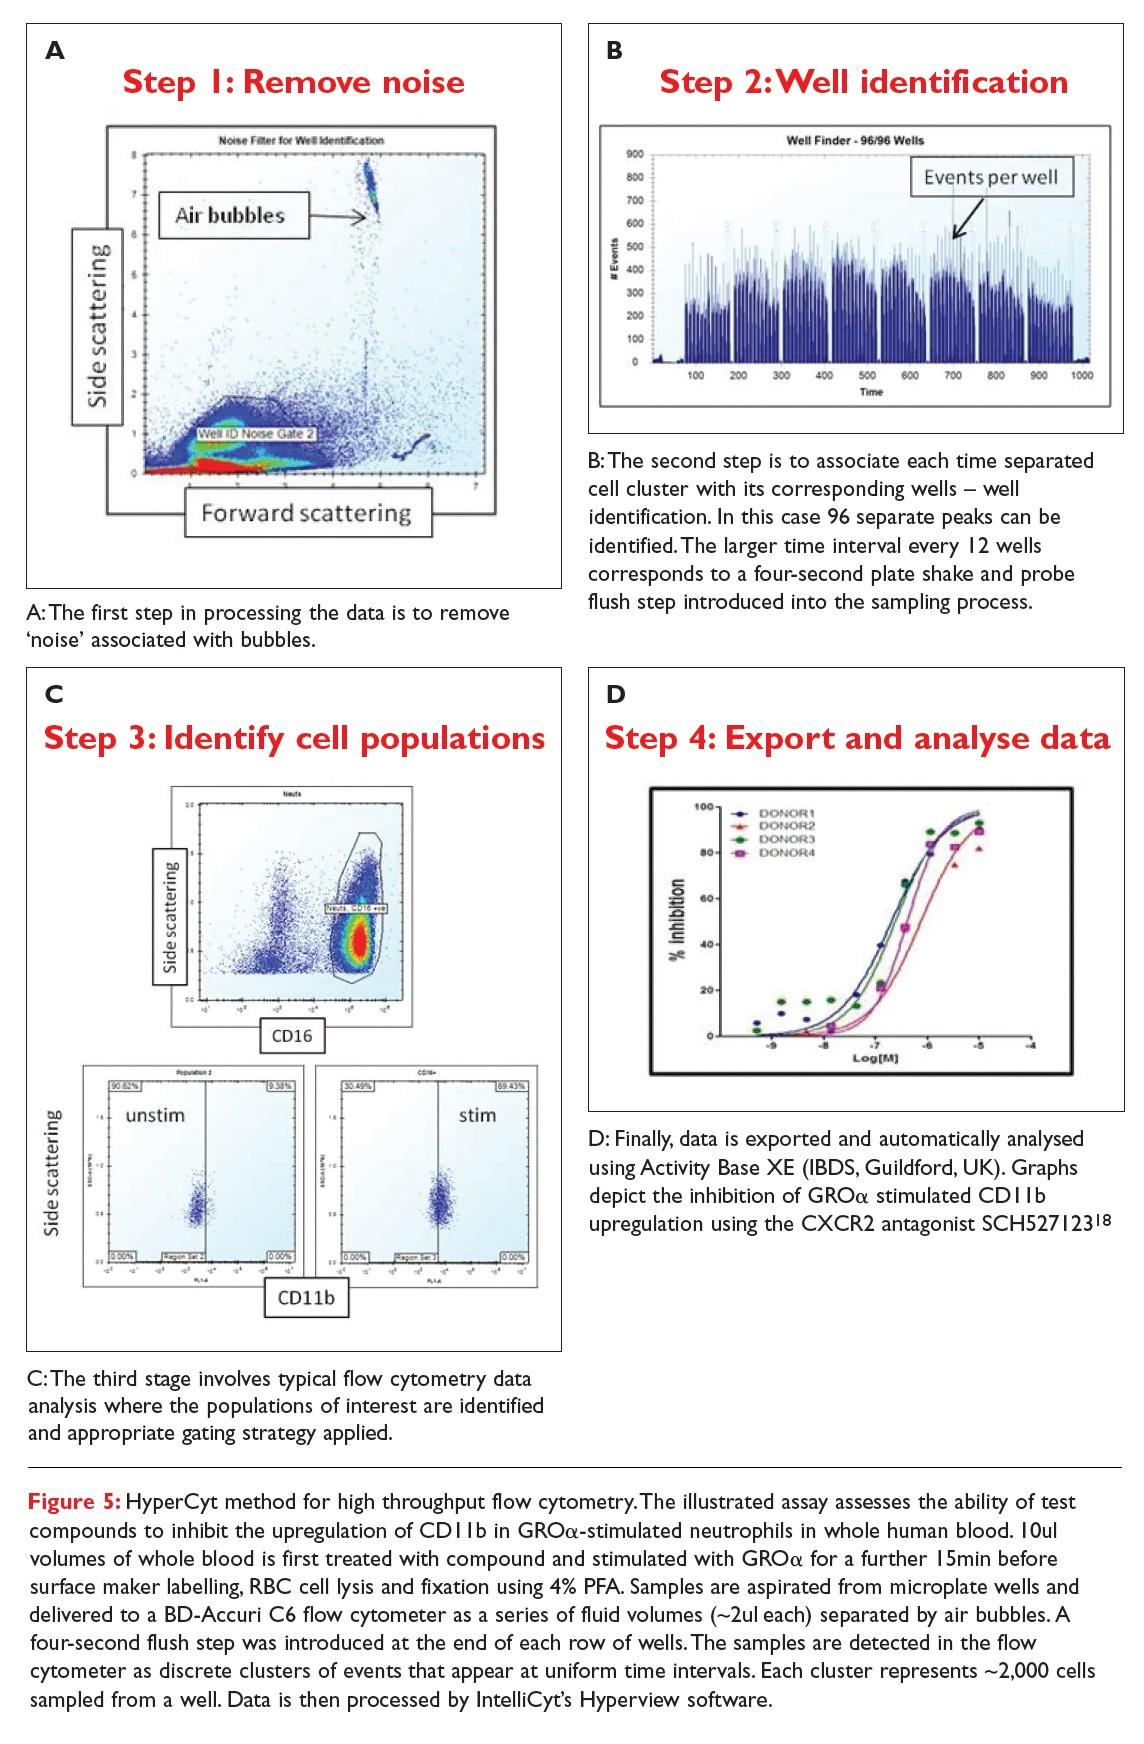 Figure 5 HyperCyt method for high throughput flow cytometry